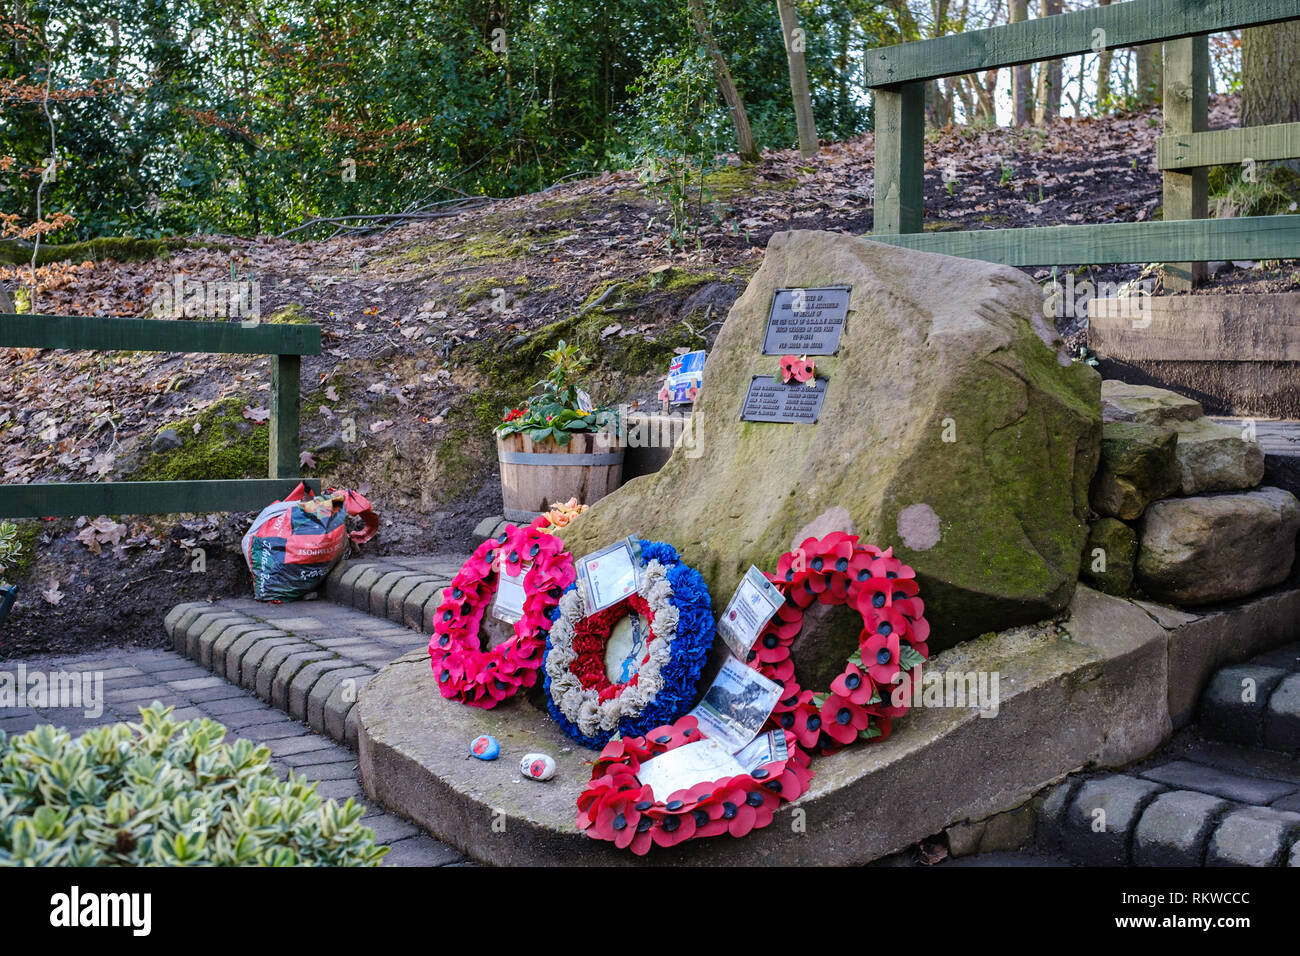 Monumento a 10 aviadores en Mi Amigo B17 Flying Fortress que se estrelló en el Parque Endcliffe, Sheffield, en febrero de 1944 Imagen De Stock